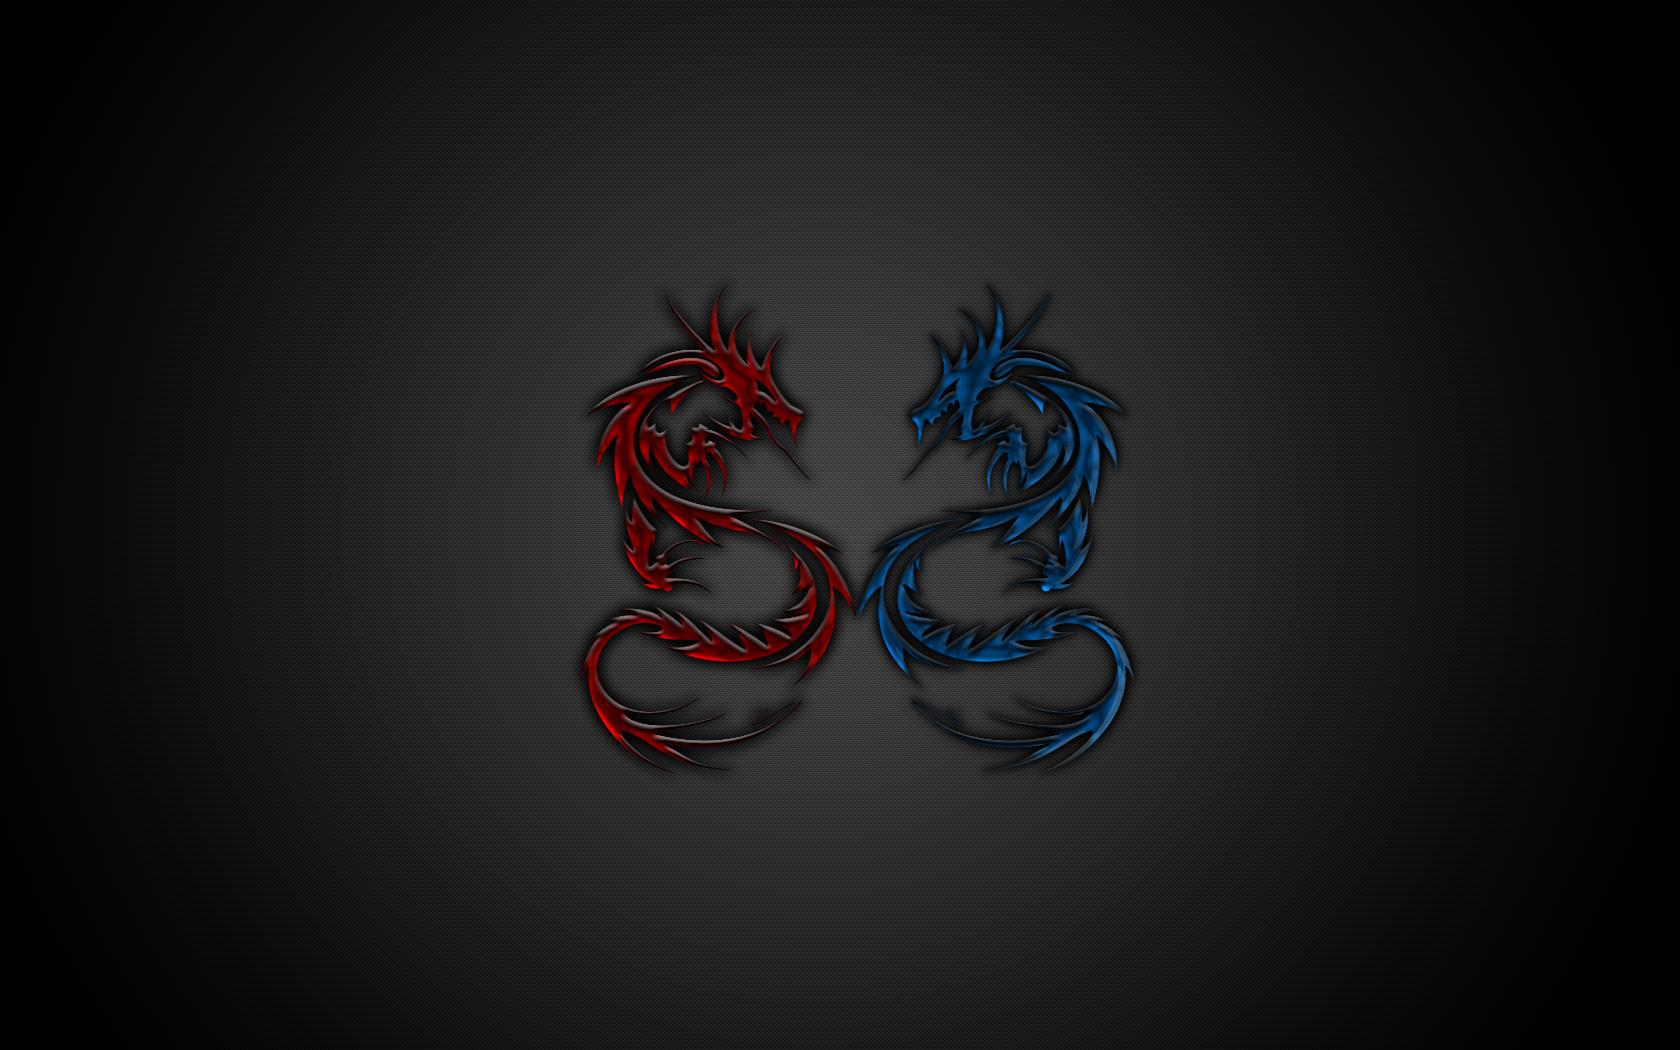 tribal dragon wallpaper by -#main